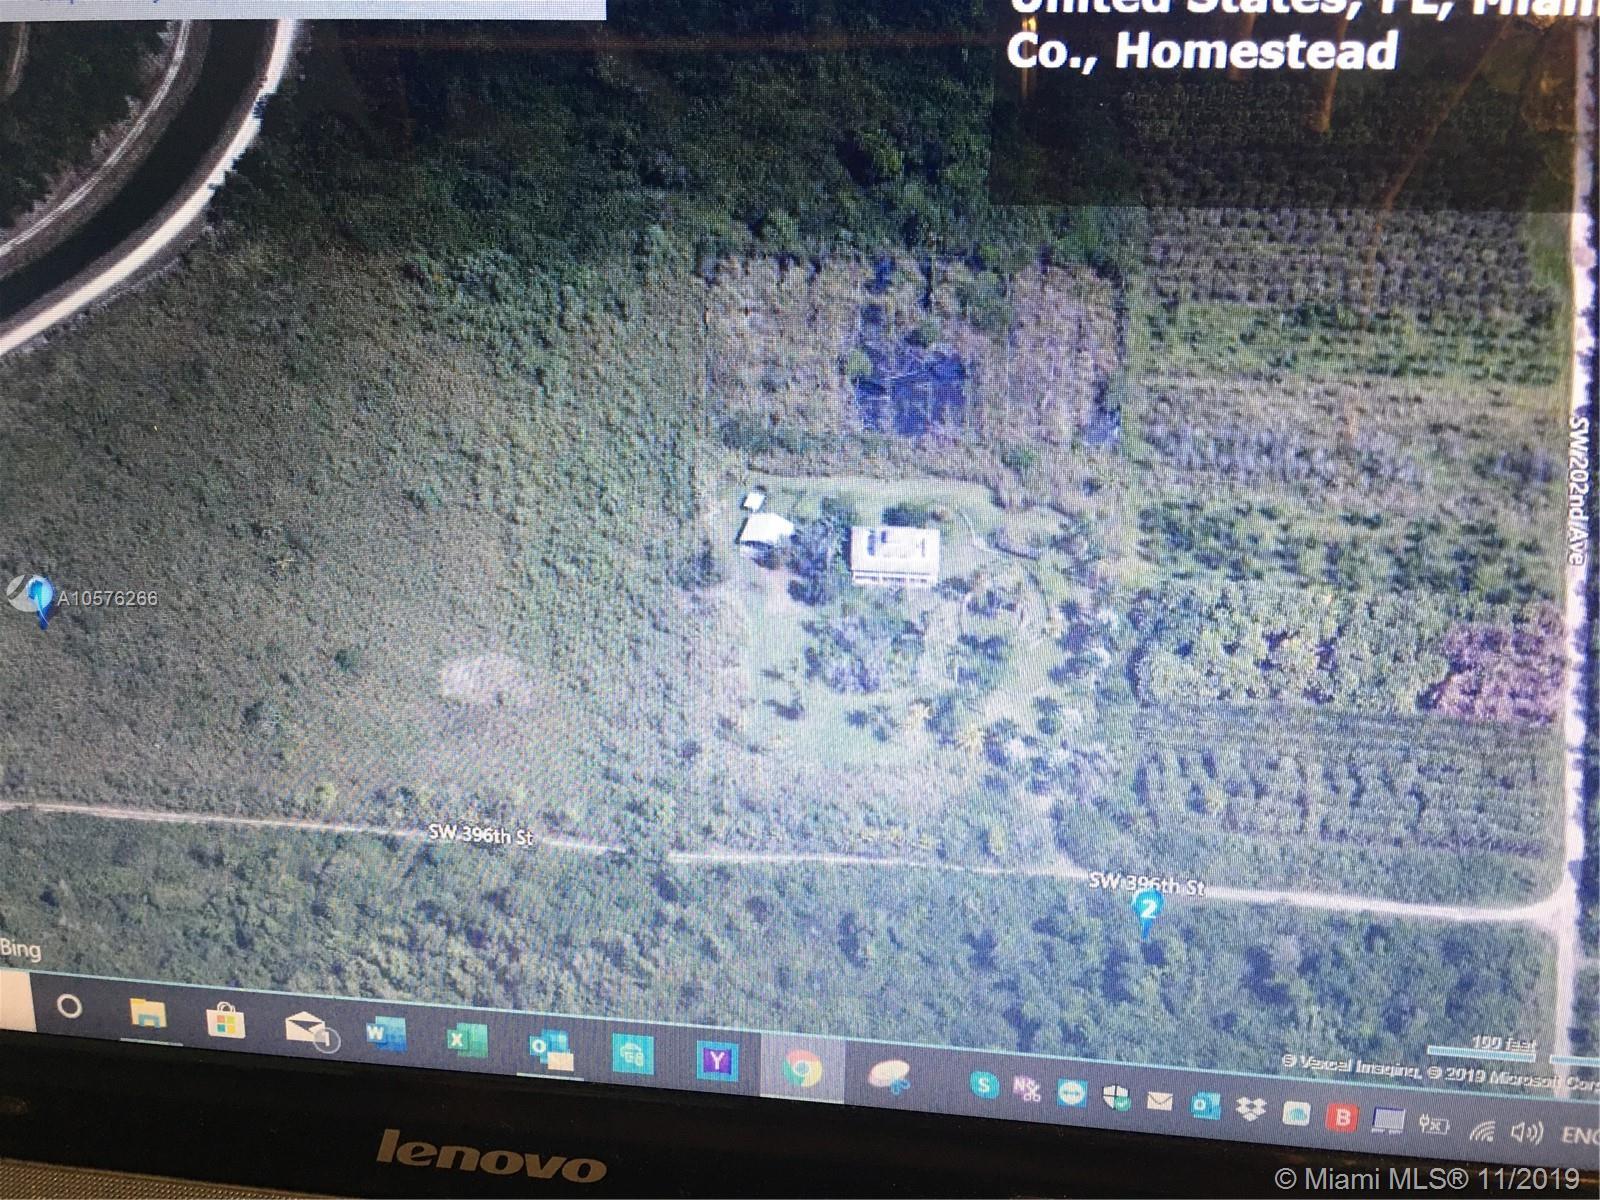 396 st, Homestead, FL 33034 - Homestead, FL real estate listing